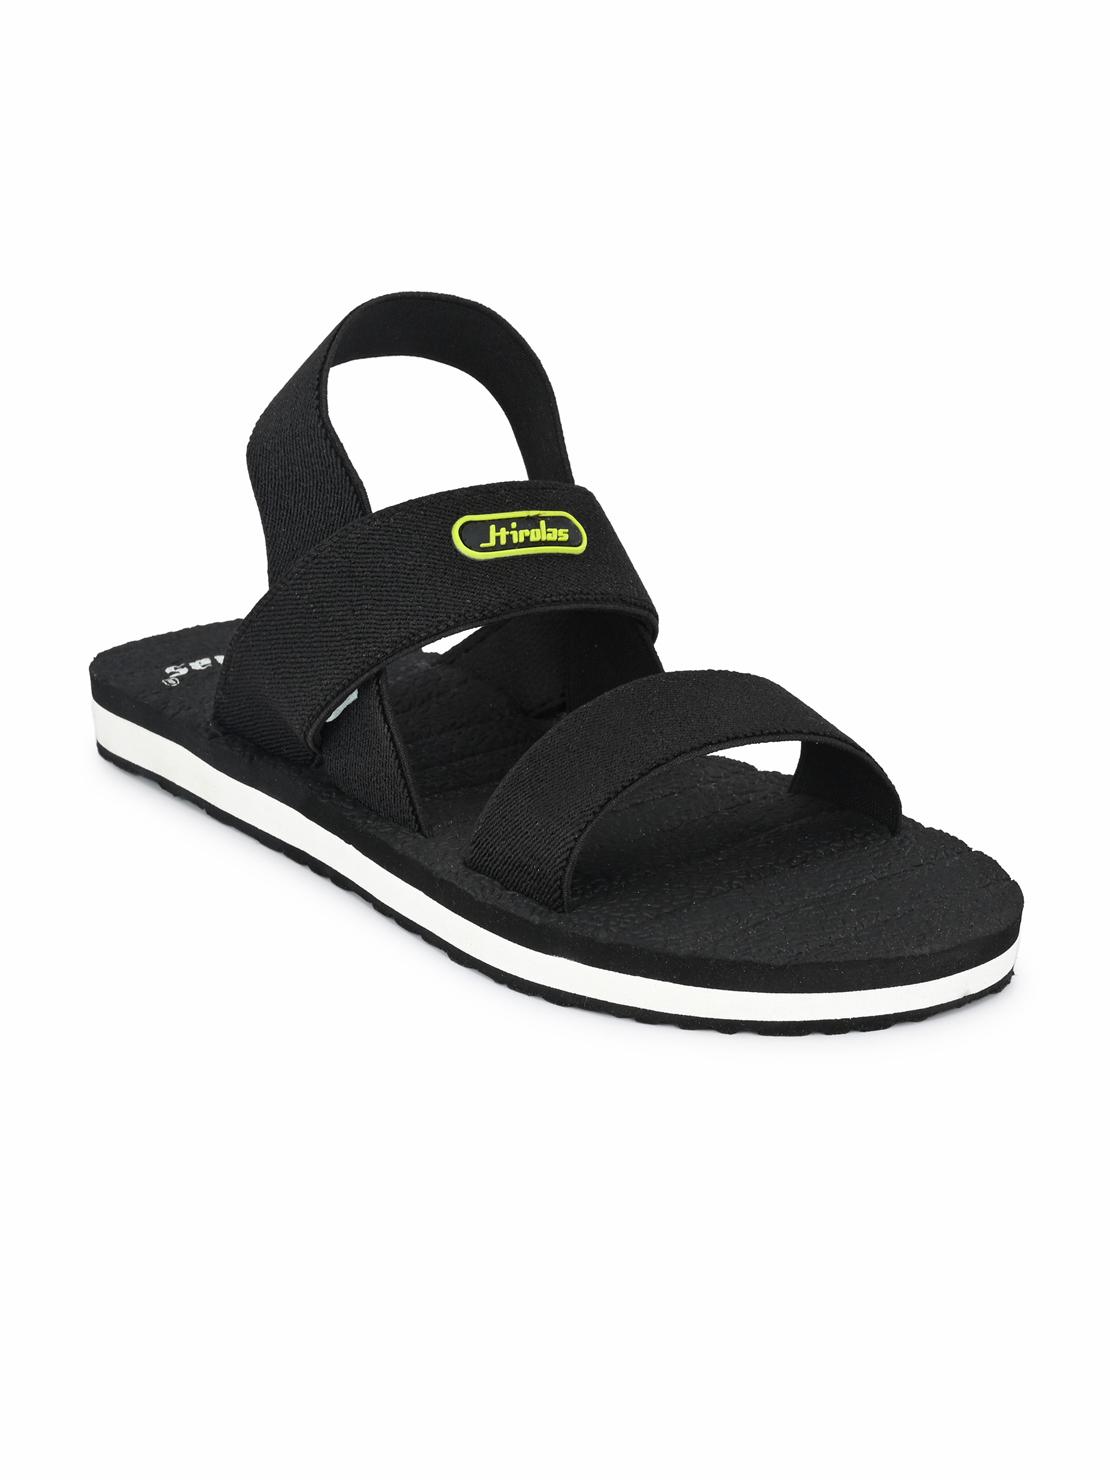 Hirolas | Hirolas Trendy Fabrication Flip-Flops Elasticated comfortable Slippers - Black